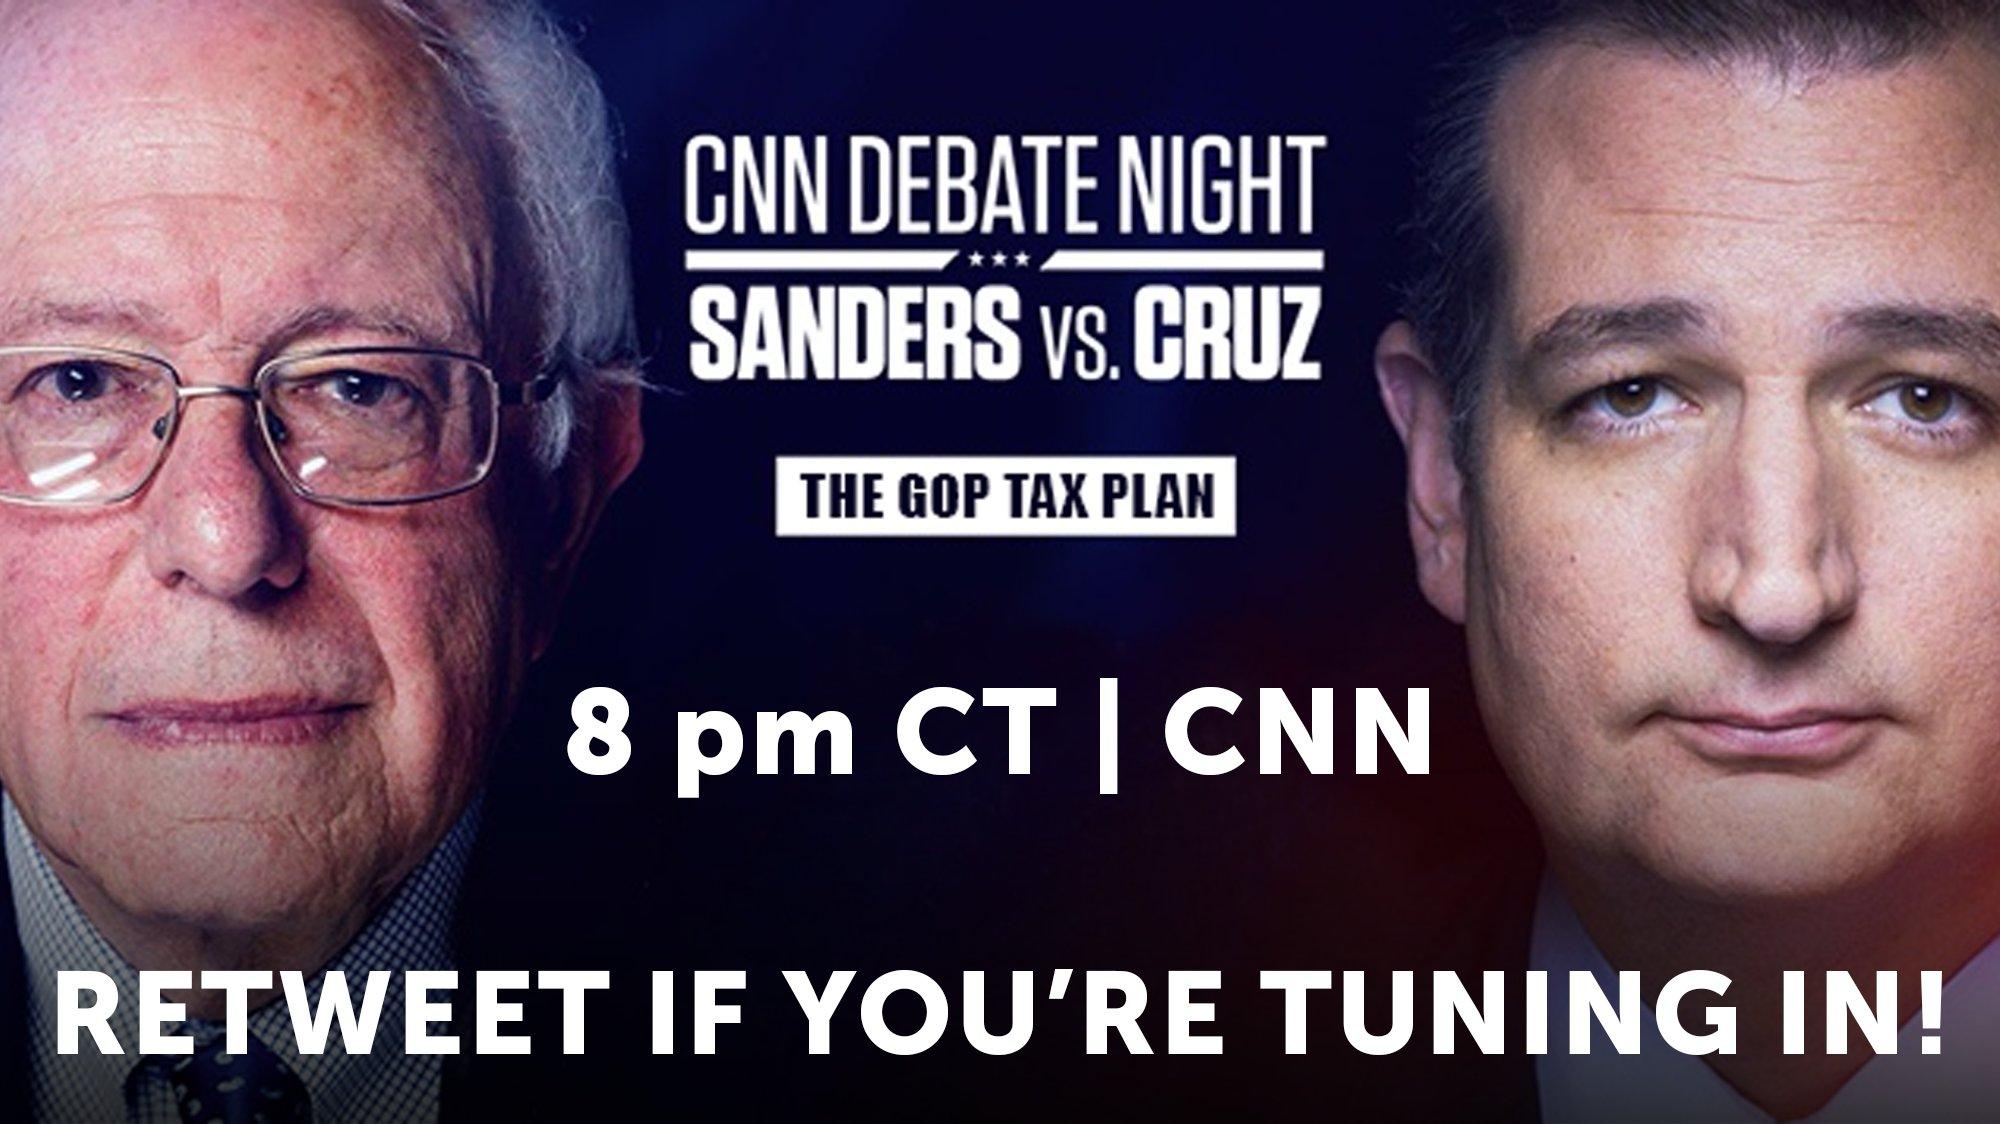 90 minutes... #TXSen #CruzCrew https://t.co/mkfMWjUlXe